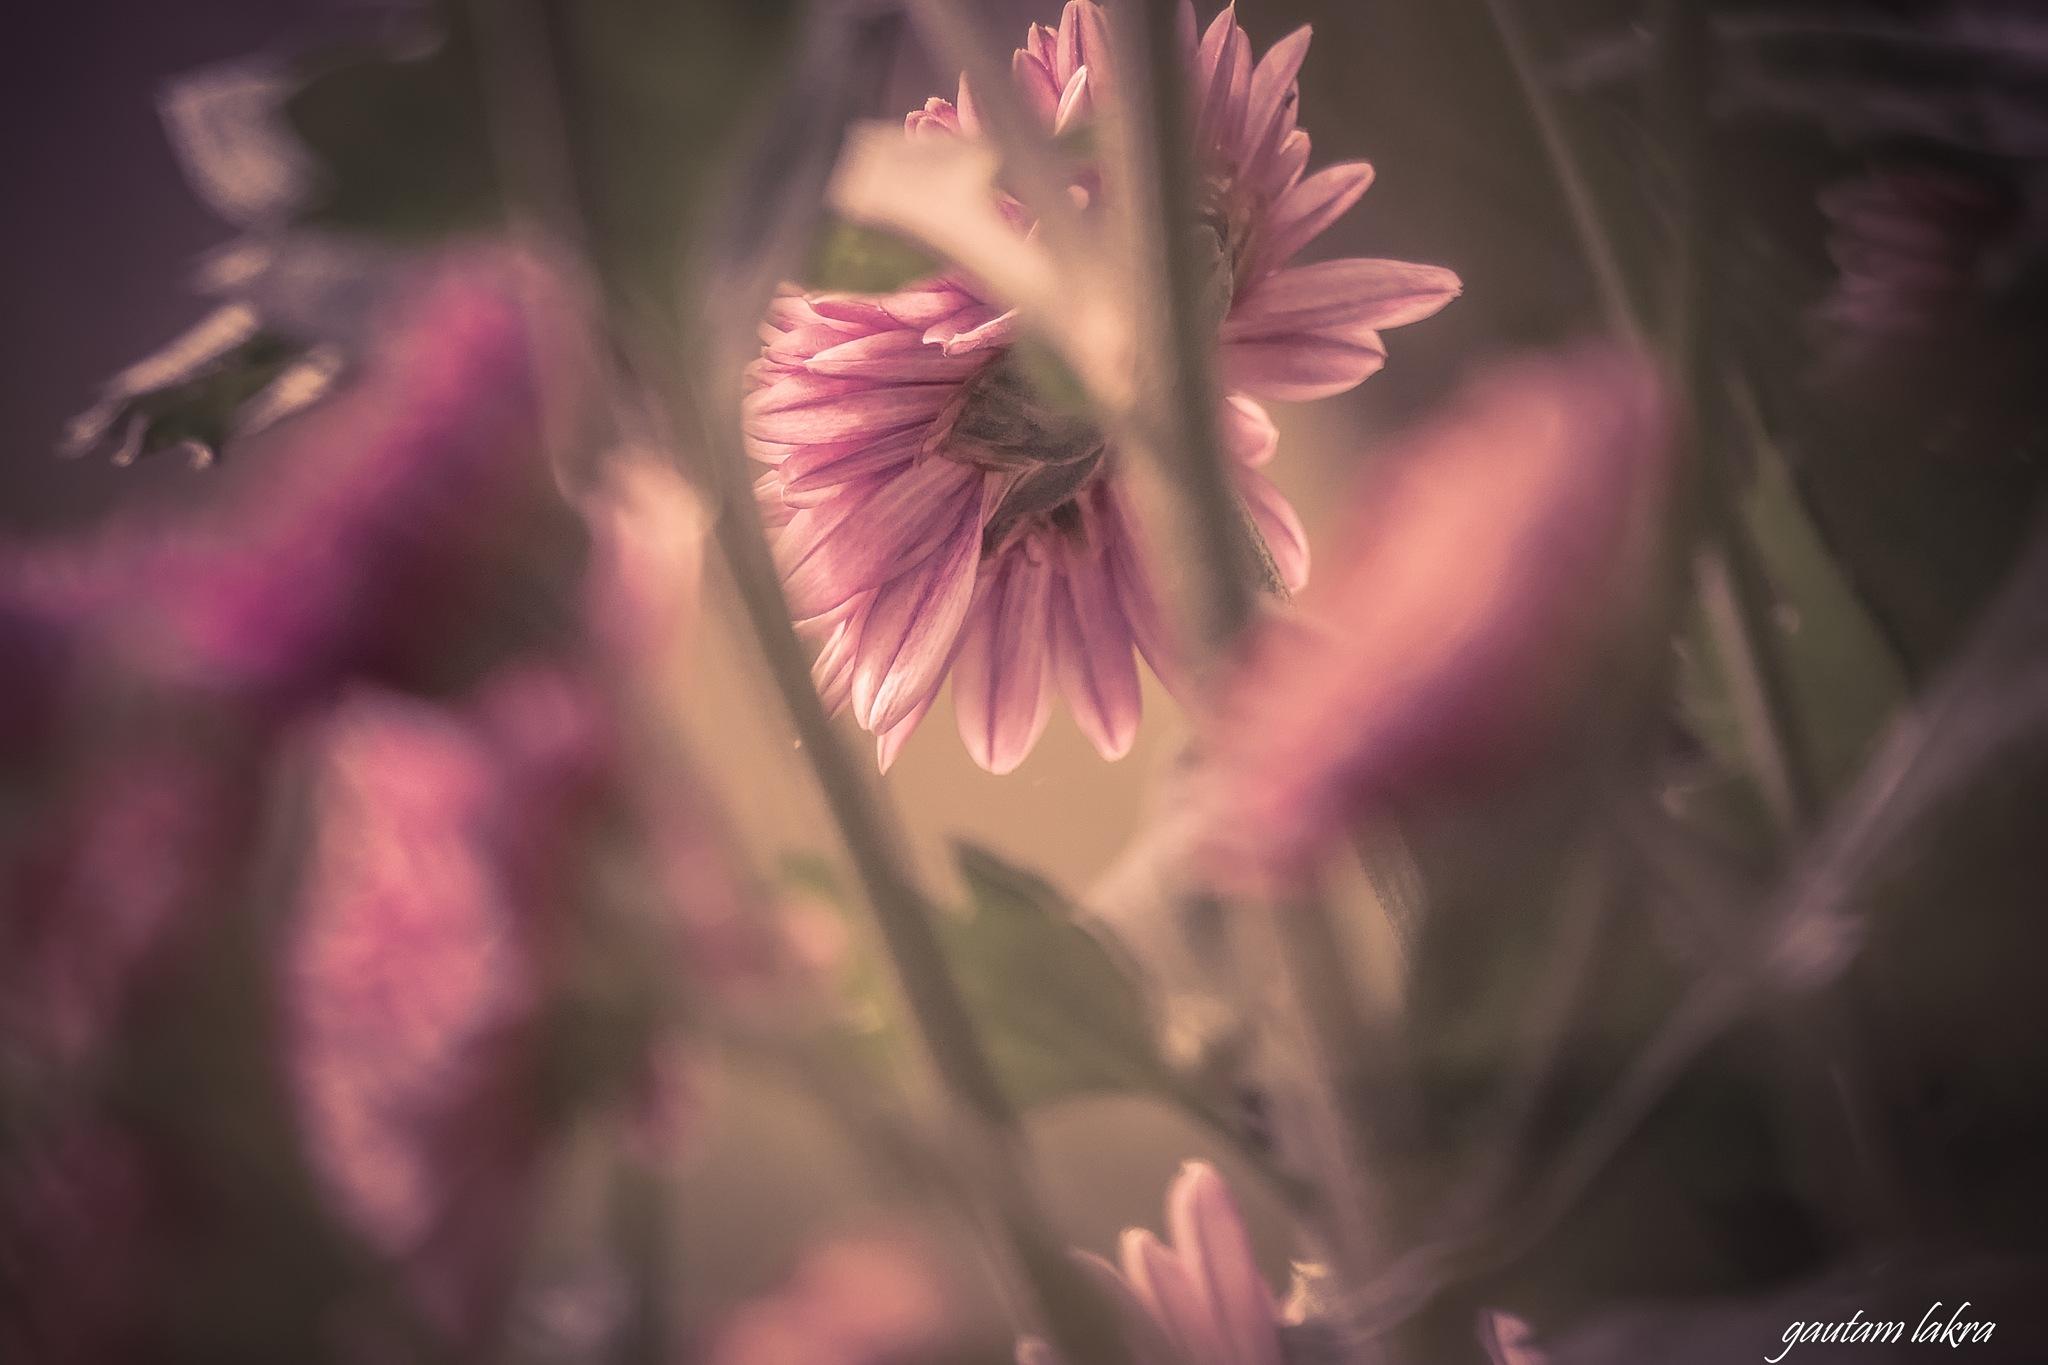 Flower season  by gautamlakra